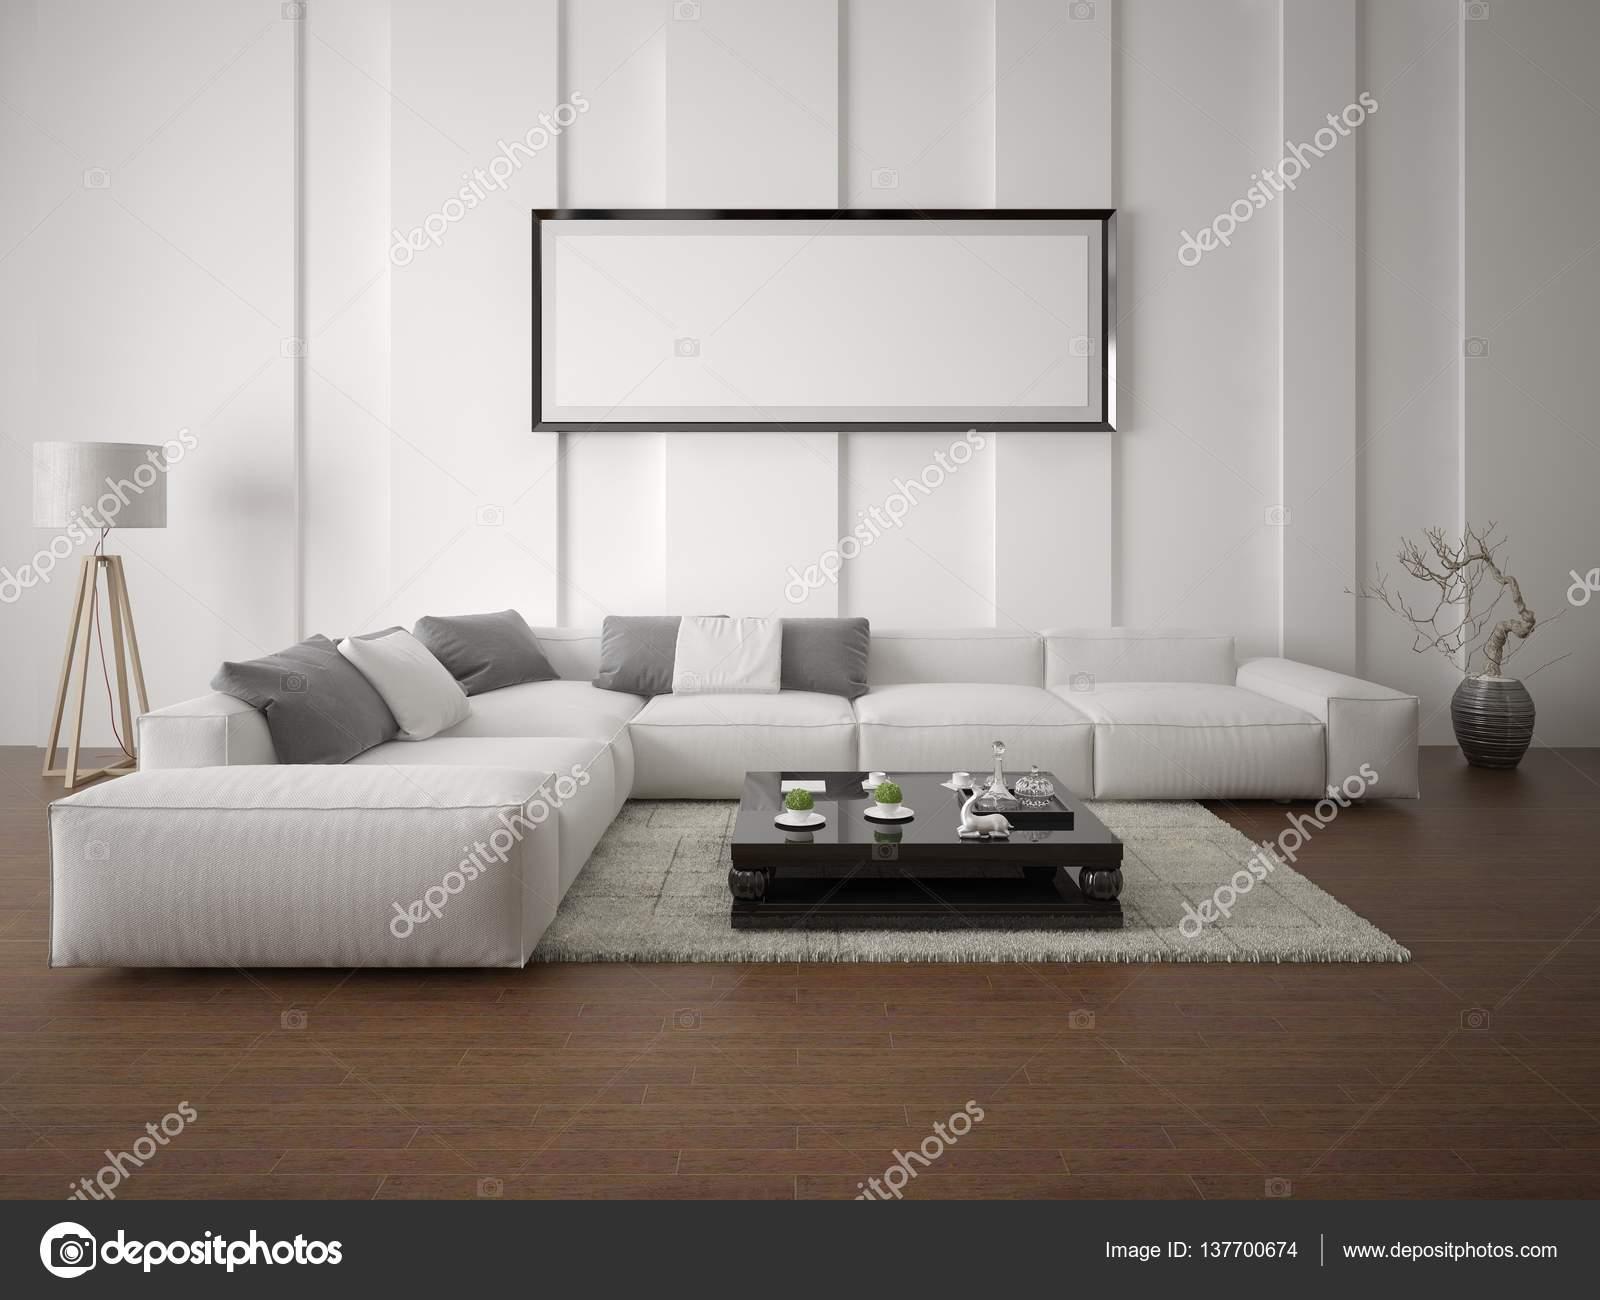 https://st3.depositphotos.com/5028327/13770/i/1600/depositphotos_137700674-stockafbeelding-mock-up-poster-ruime-woonkamer.jpg